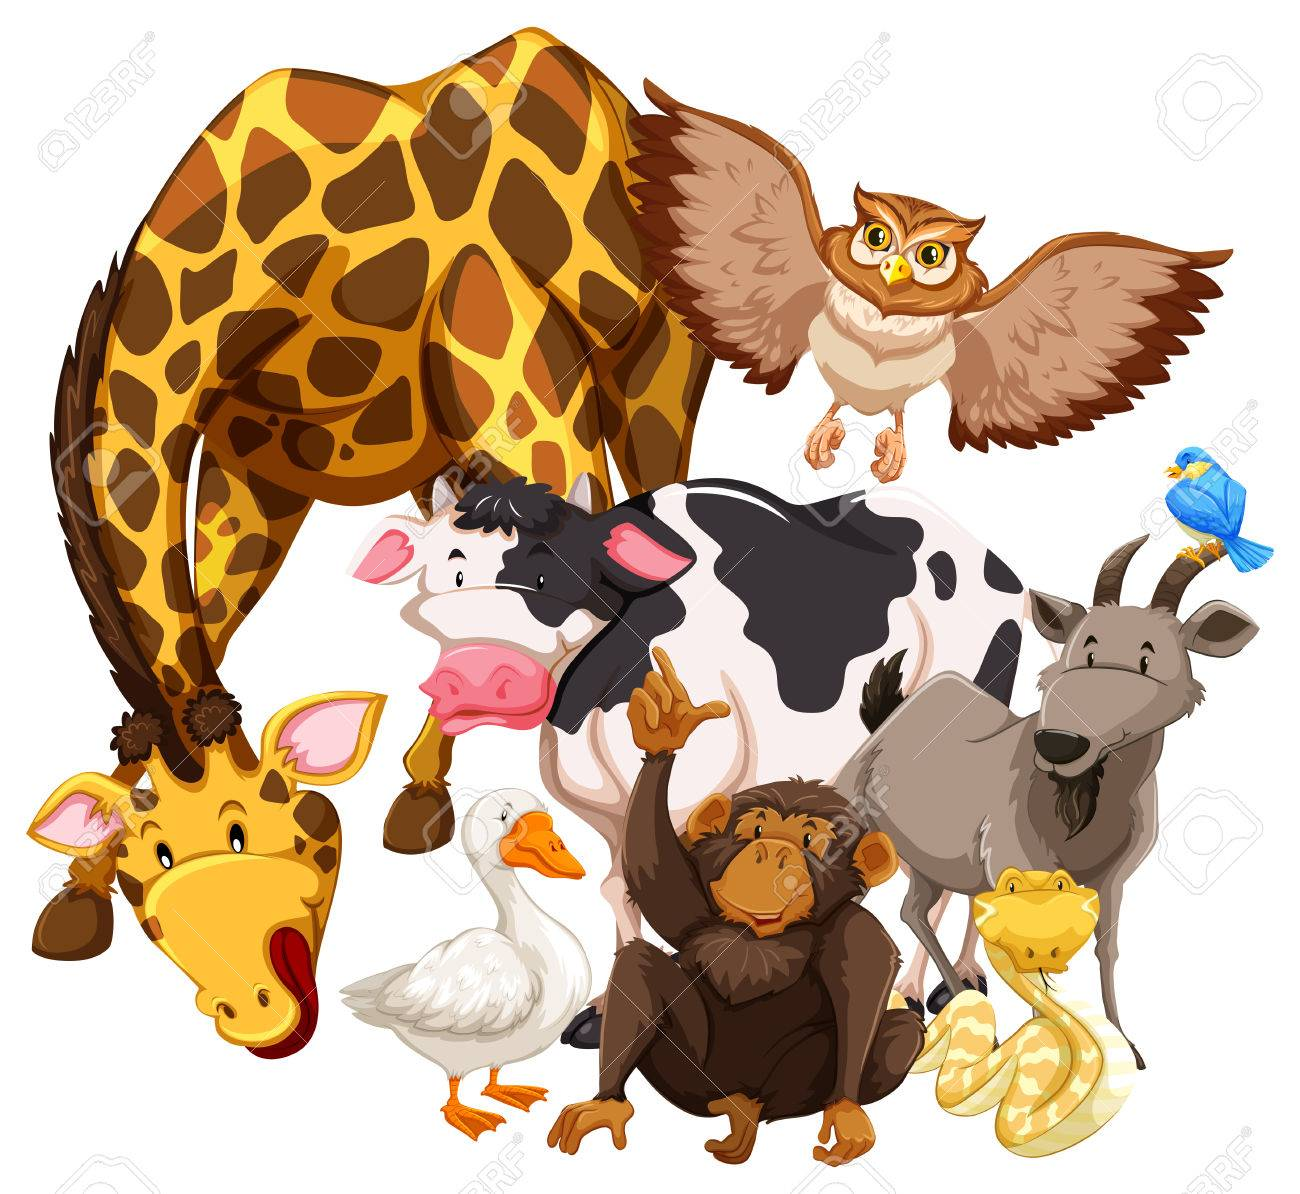 Different kind of animals living together.